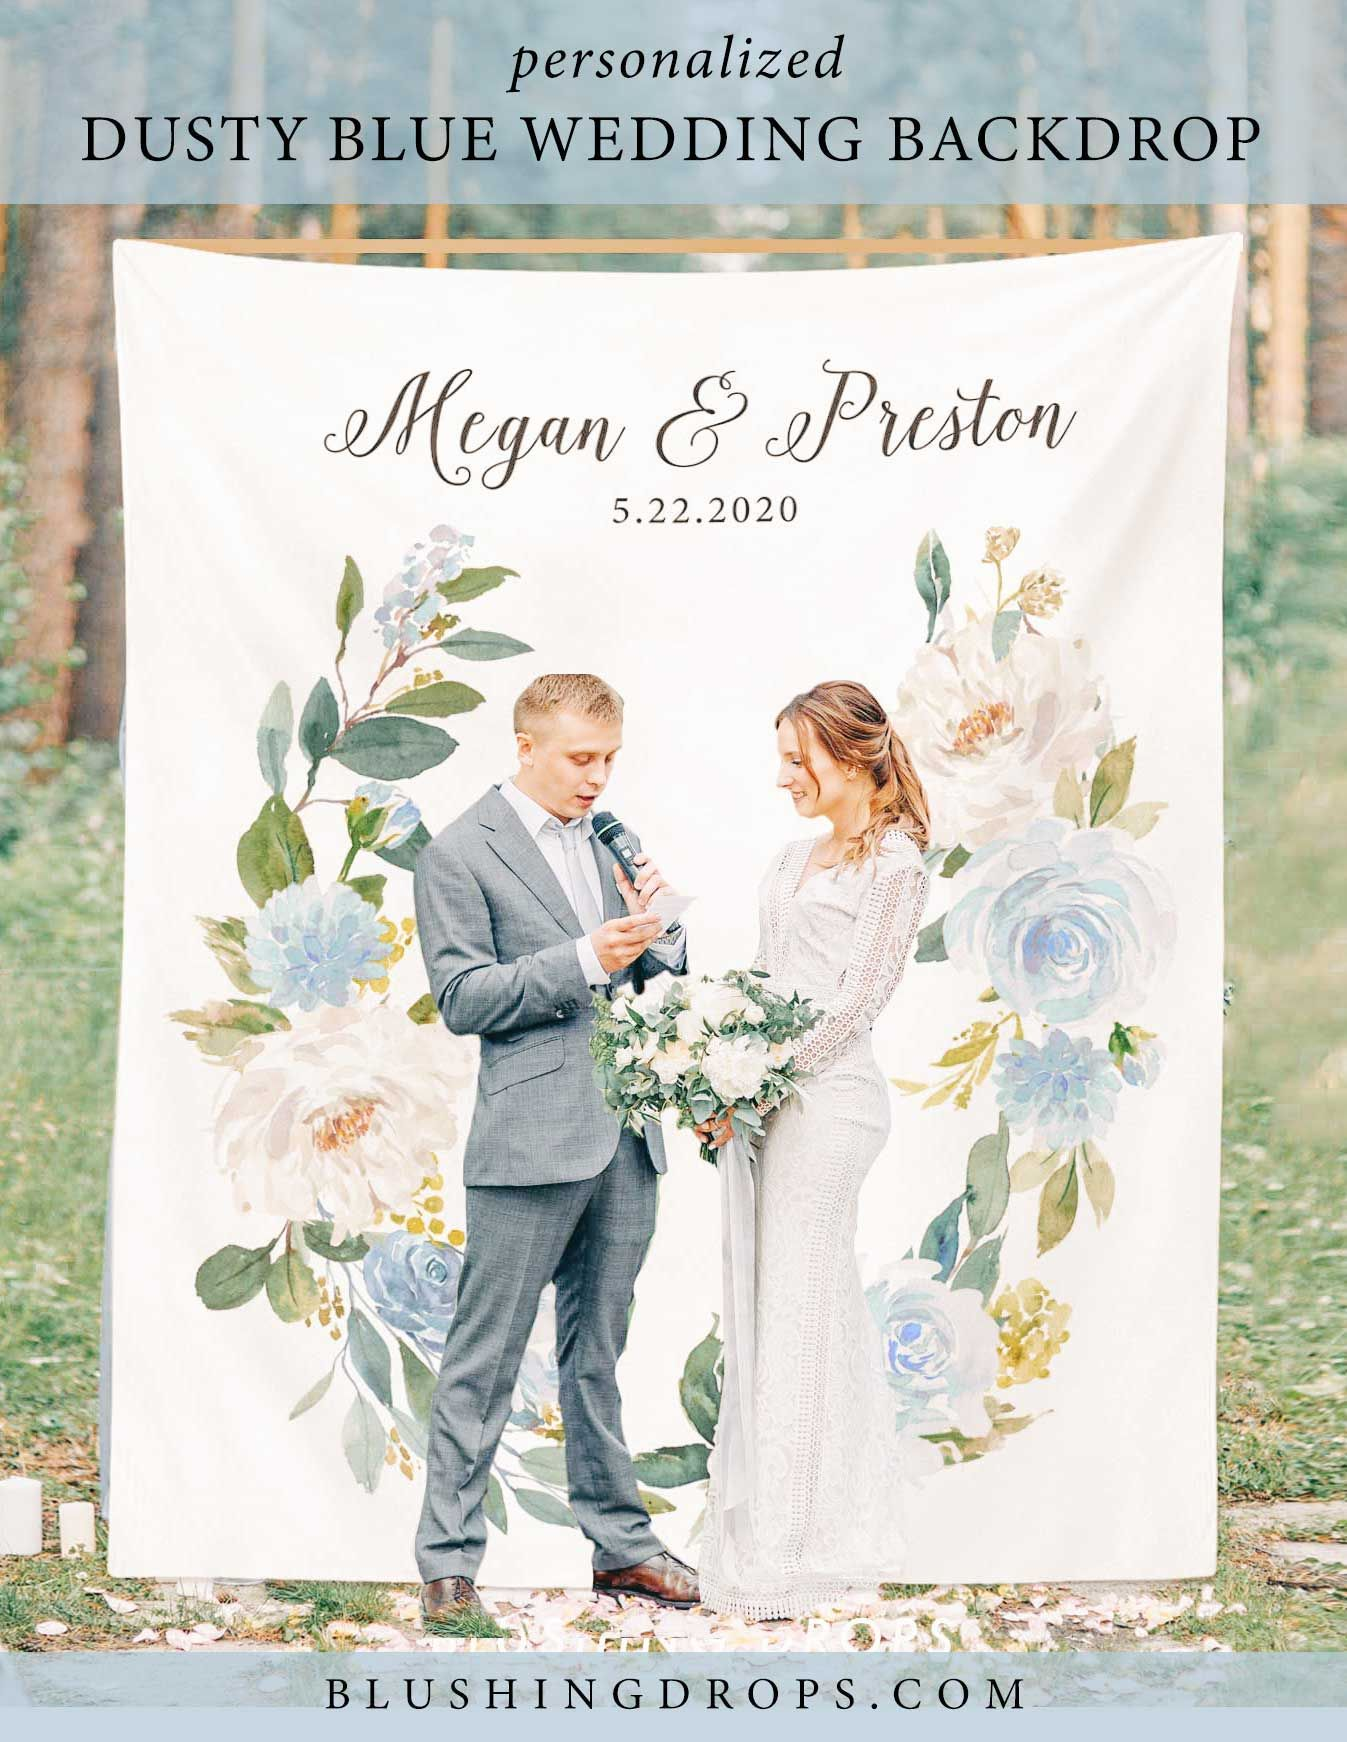 Wedding Backdrop for Ceremony, Dusty Blue Wedding Backdrop, Summer Photo Booth Backdrop, Wedding Photo Backdrop, Floral Backdrop Blue #backdropsforphotographs